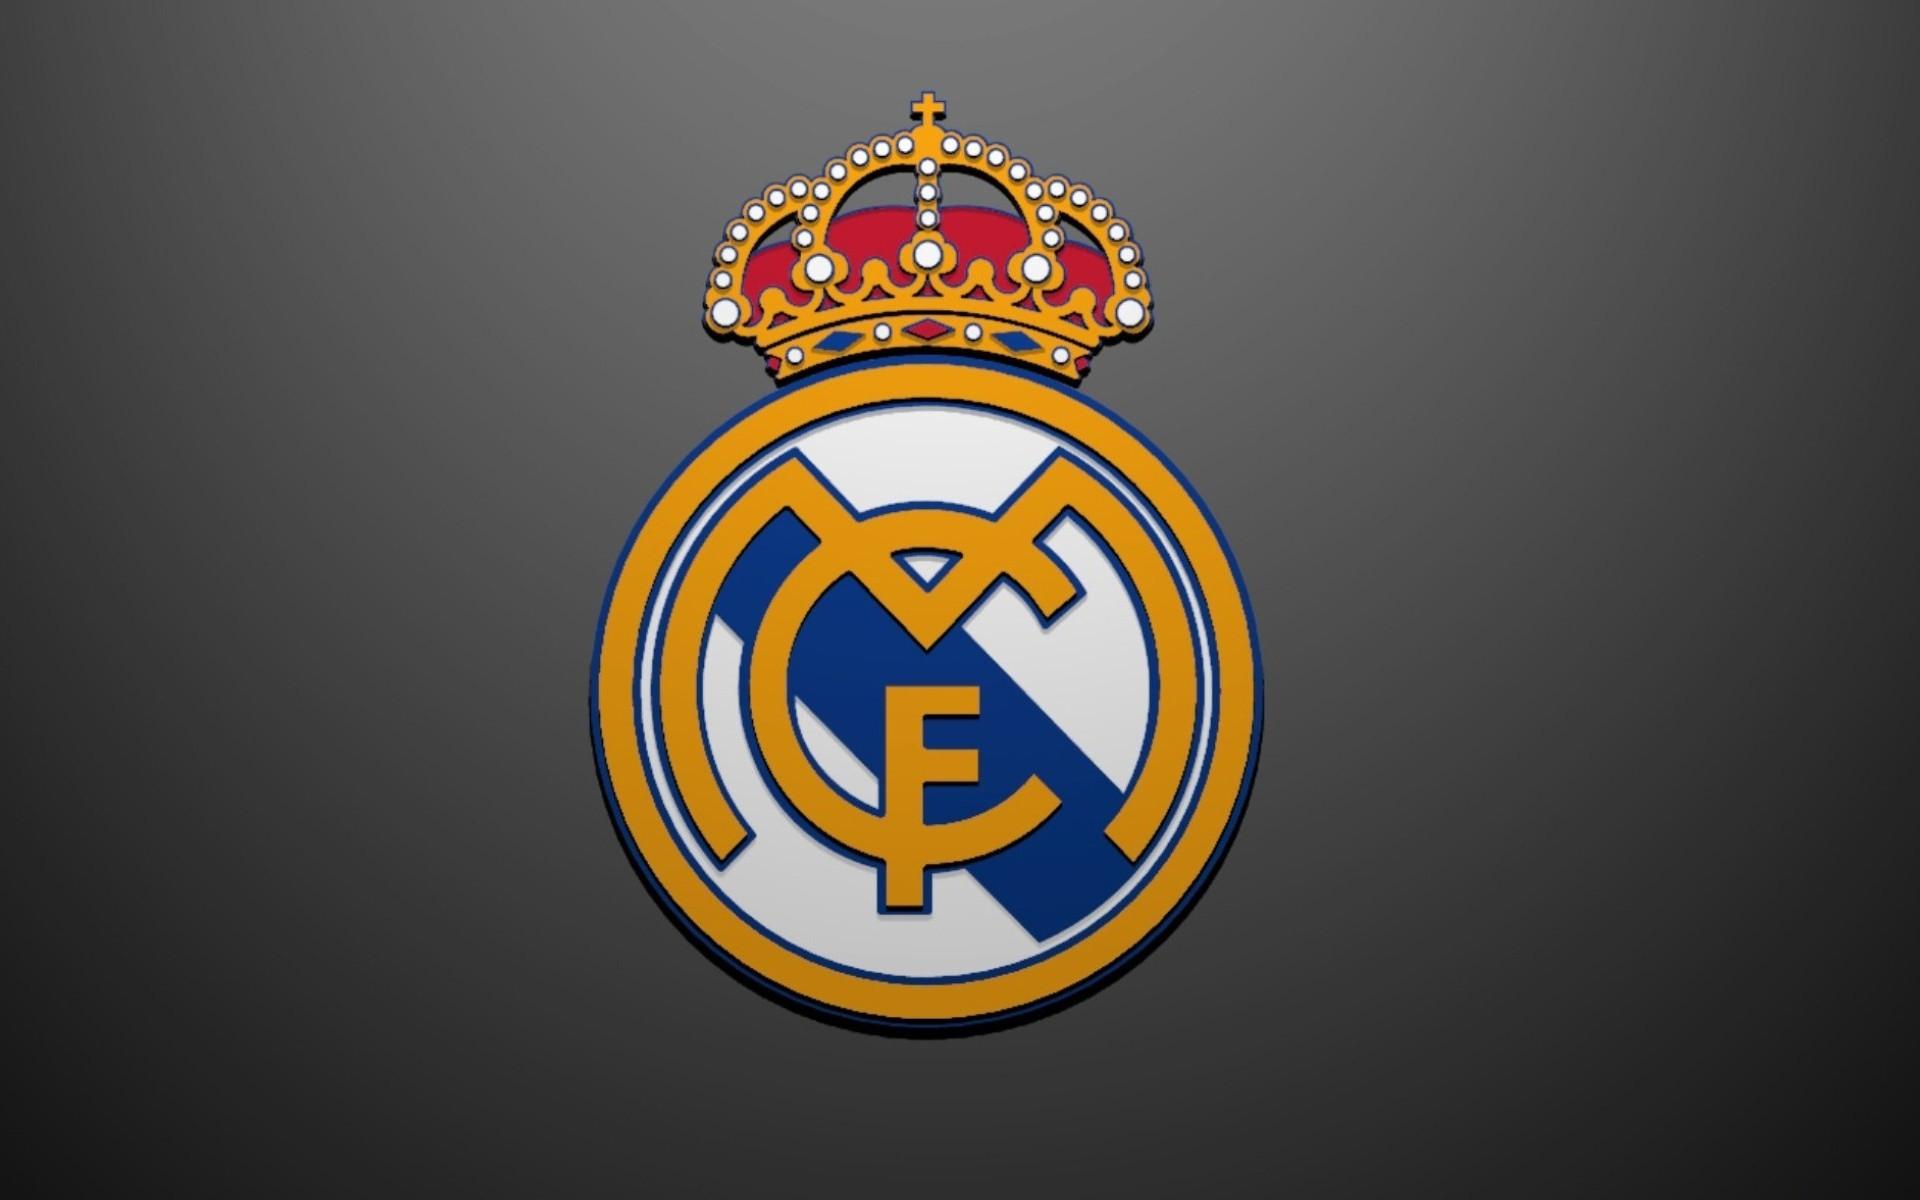 Res: 1920x1200, Sport - Real Madrid C.F. Wallpaper